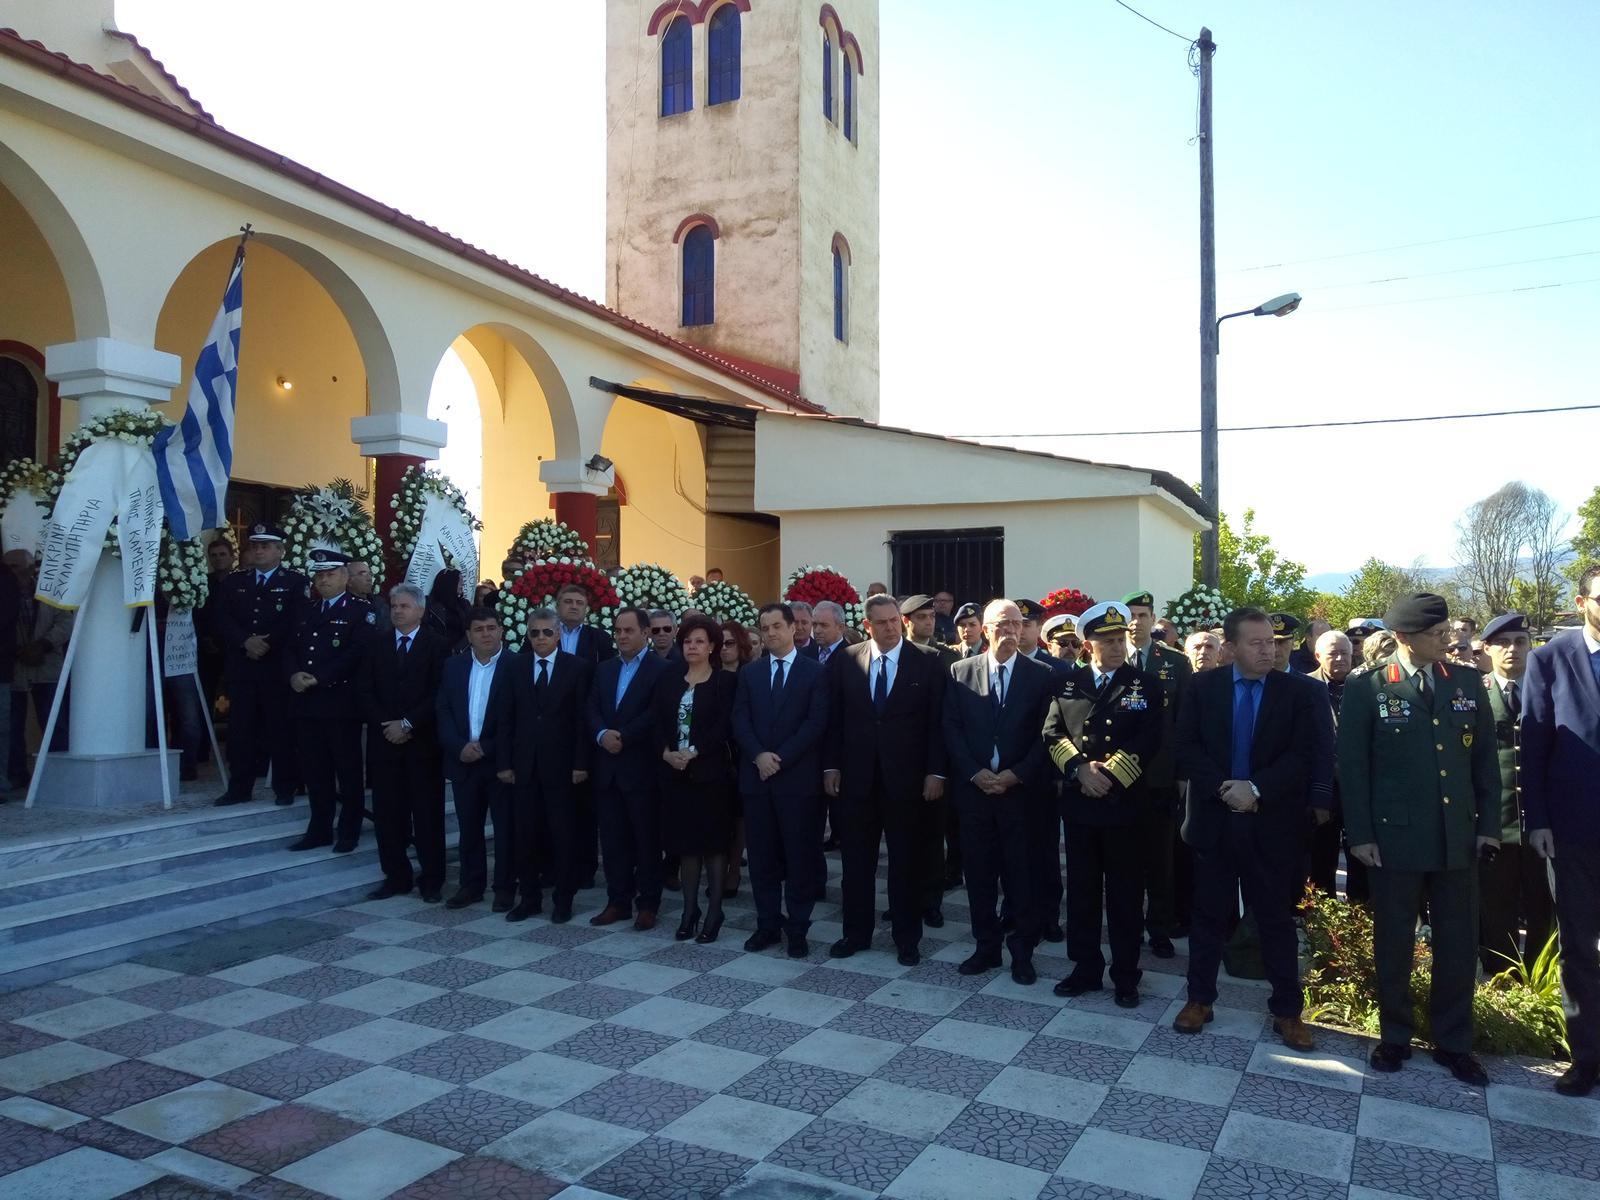 kidieia-paron-ena Σπαραγμός στις κηδείες των στελεχών των Ενόπλων Δυνάμεων που σκοτώθηκαν με το μοιραίο Χιούι